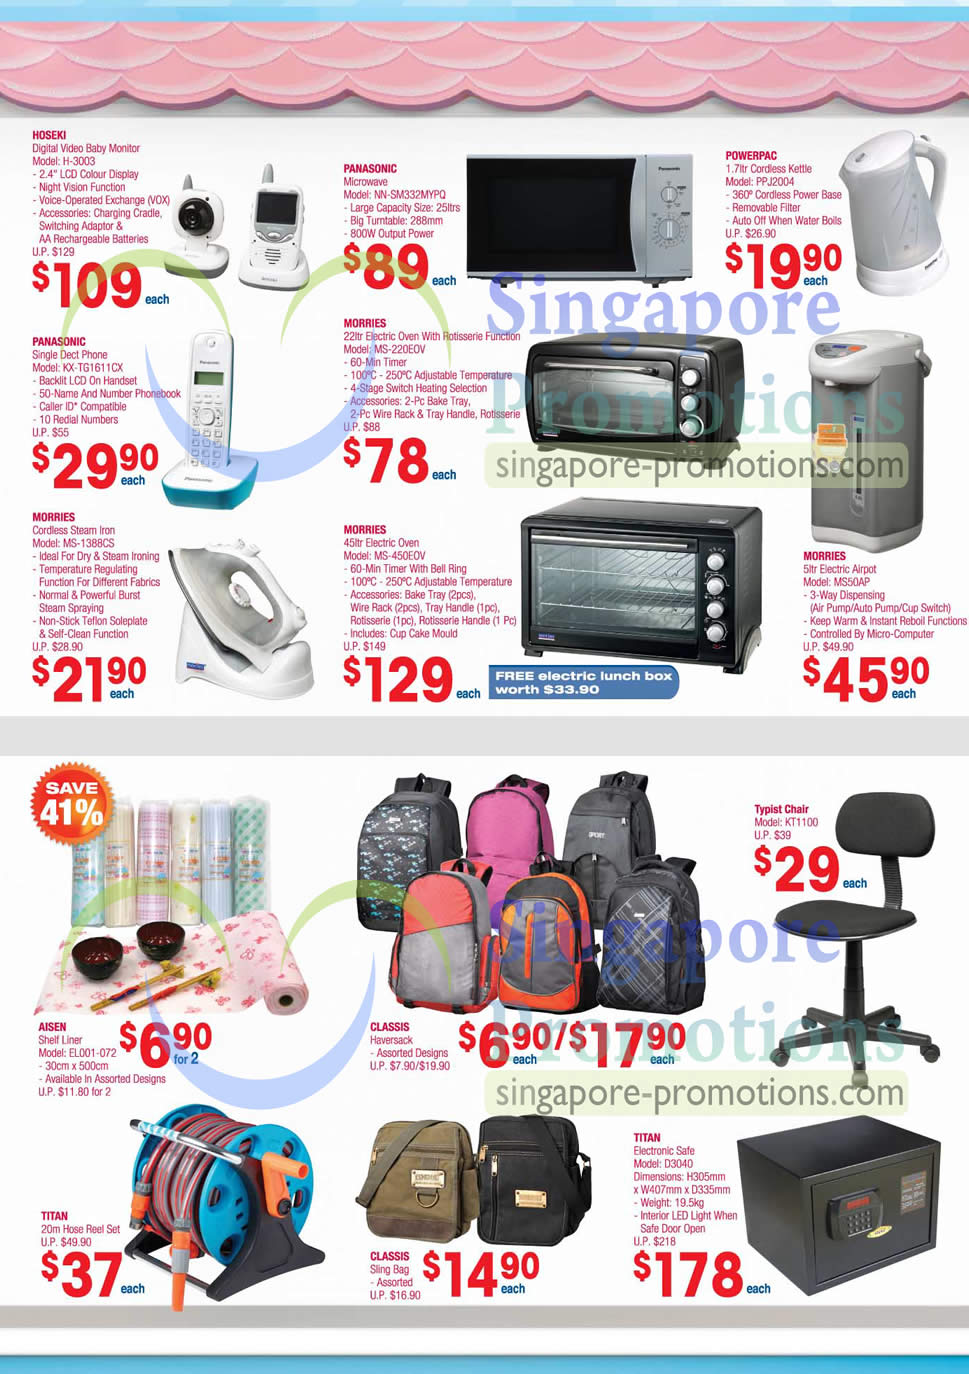 Kitchen Appliances Backpacks Hoseki H 3003 Baby Monitor